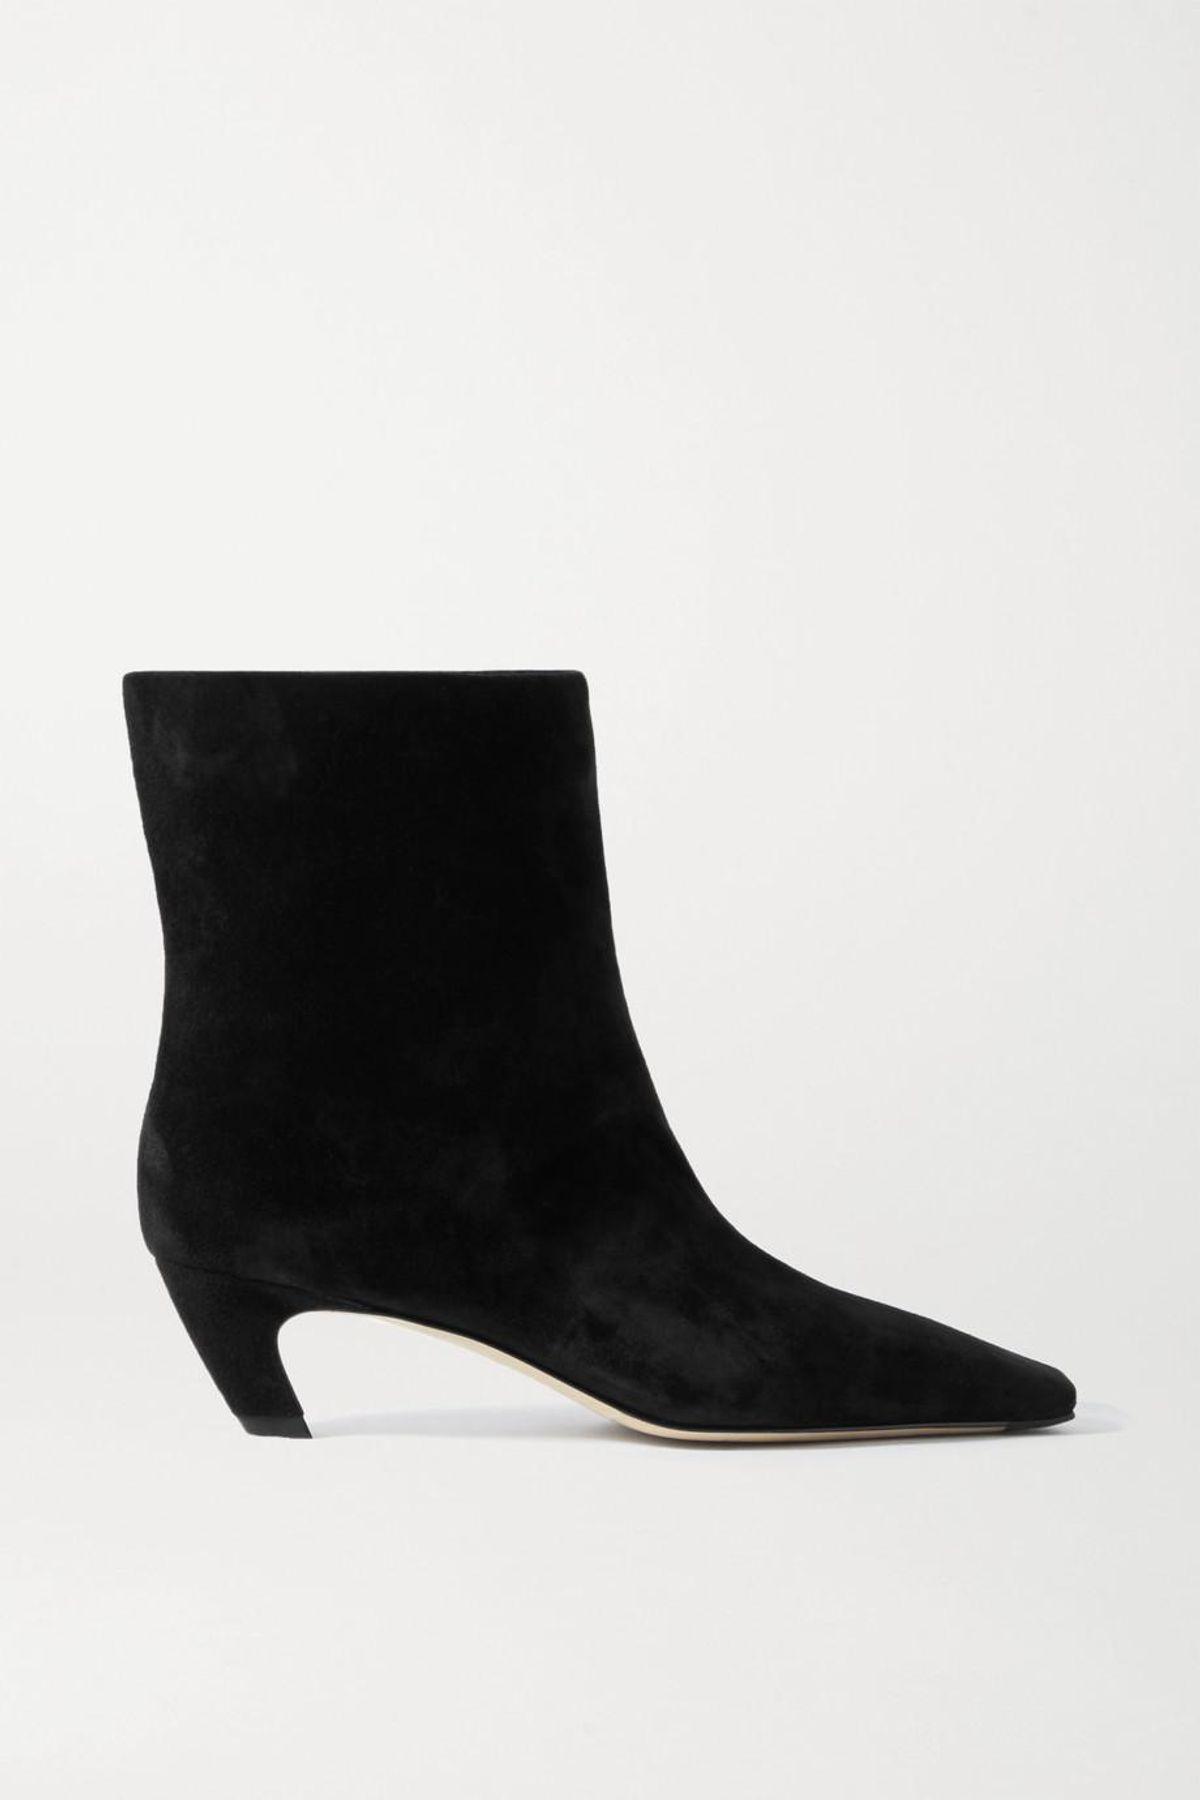 khaite arizona suede ankle boots